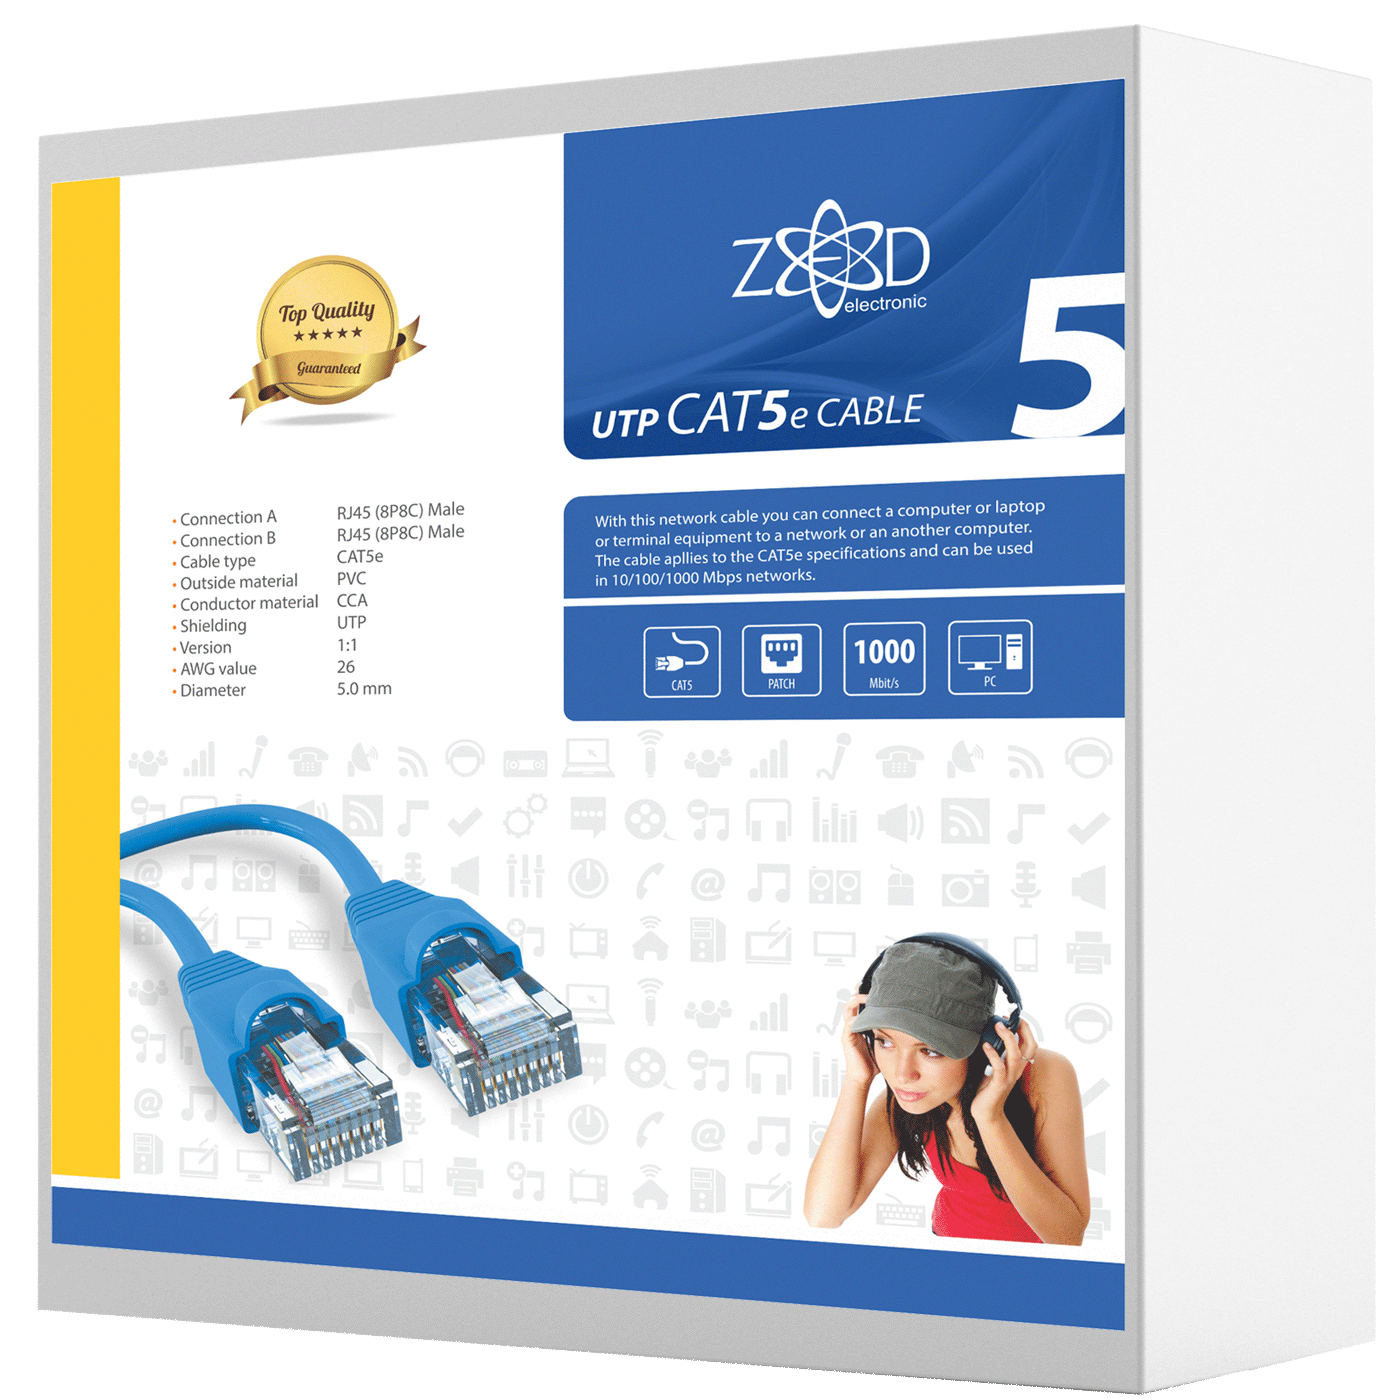 ZED electronic - FTPC/30